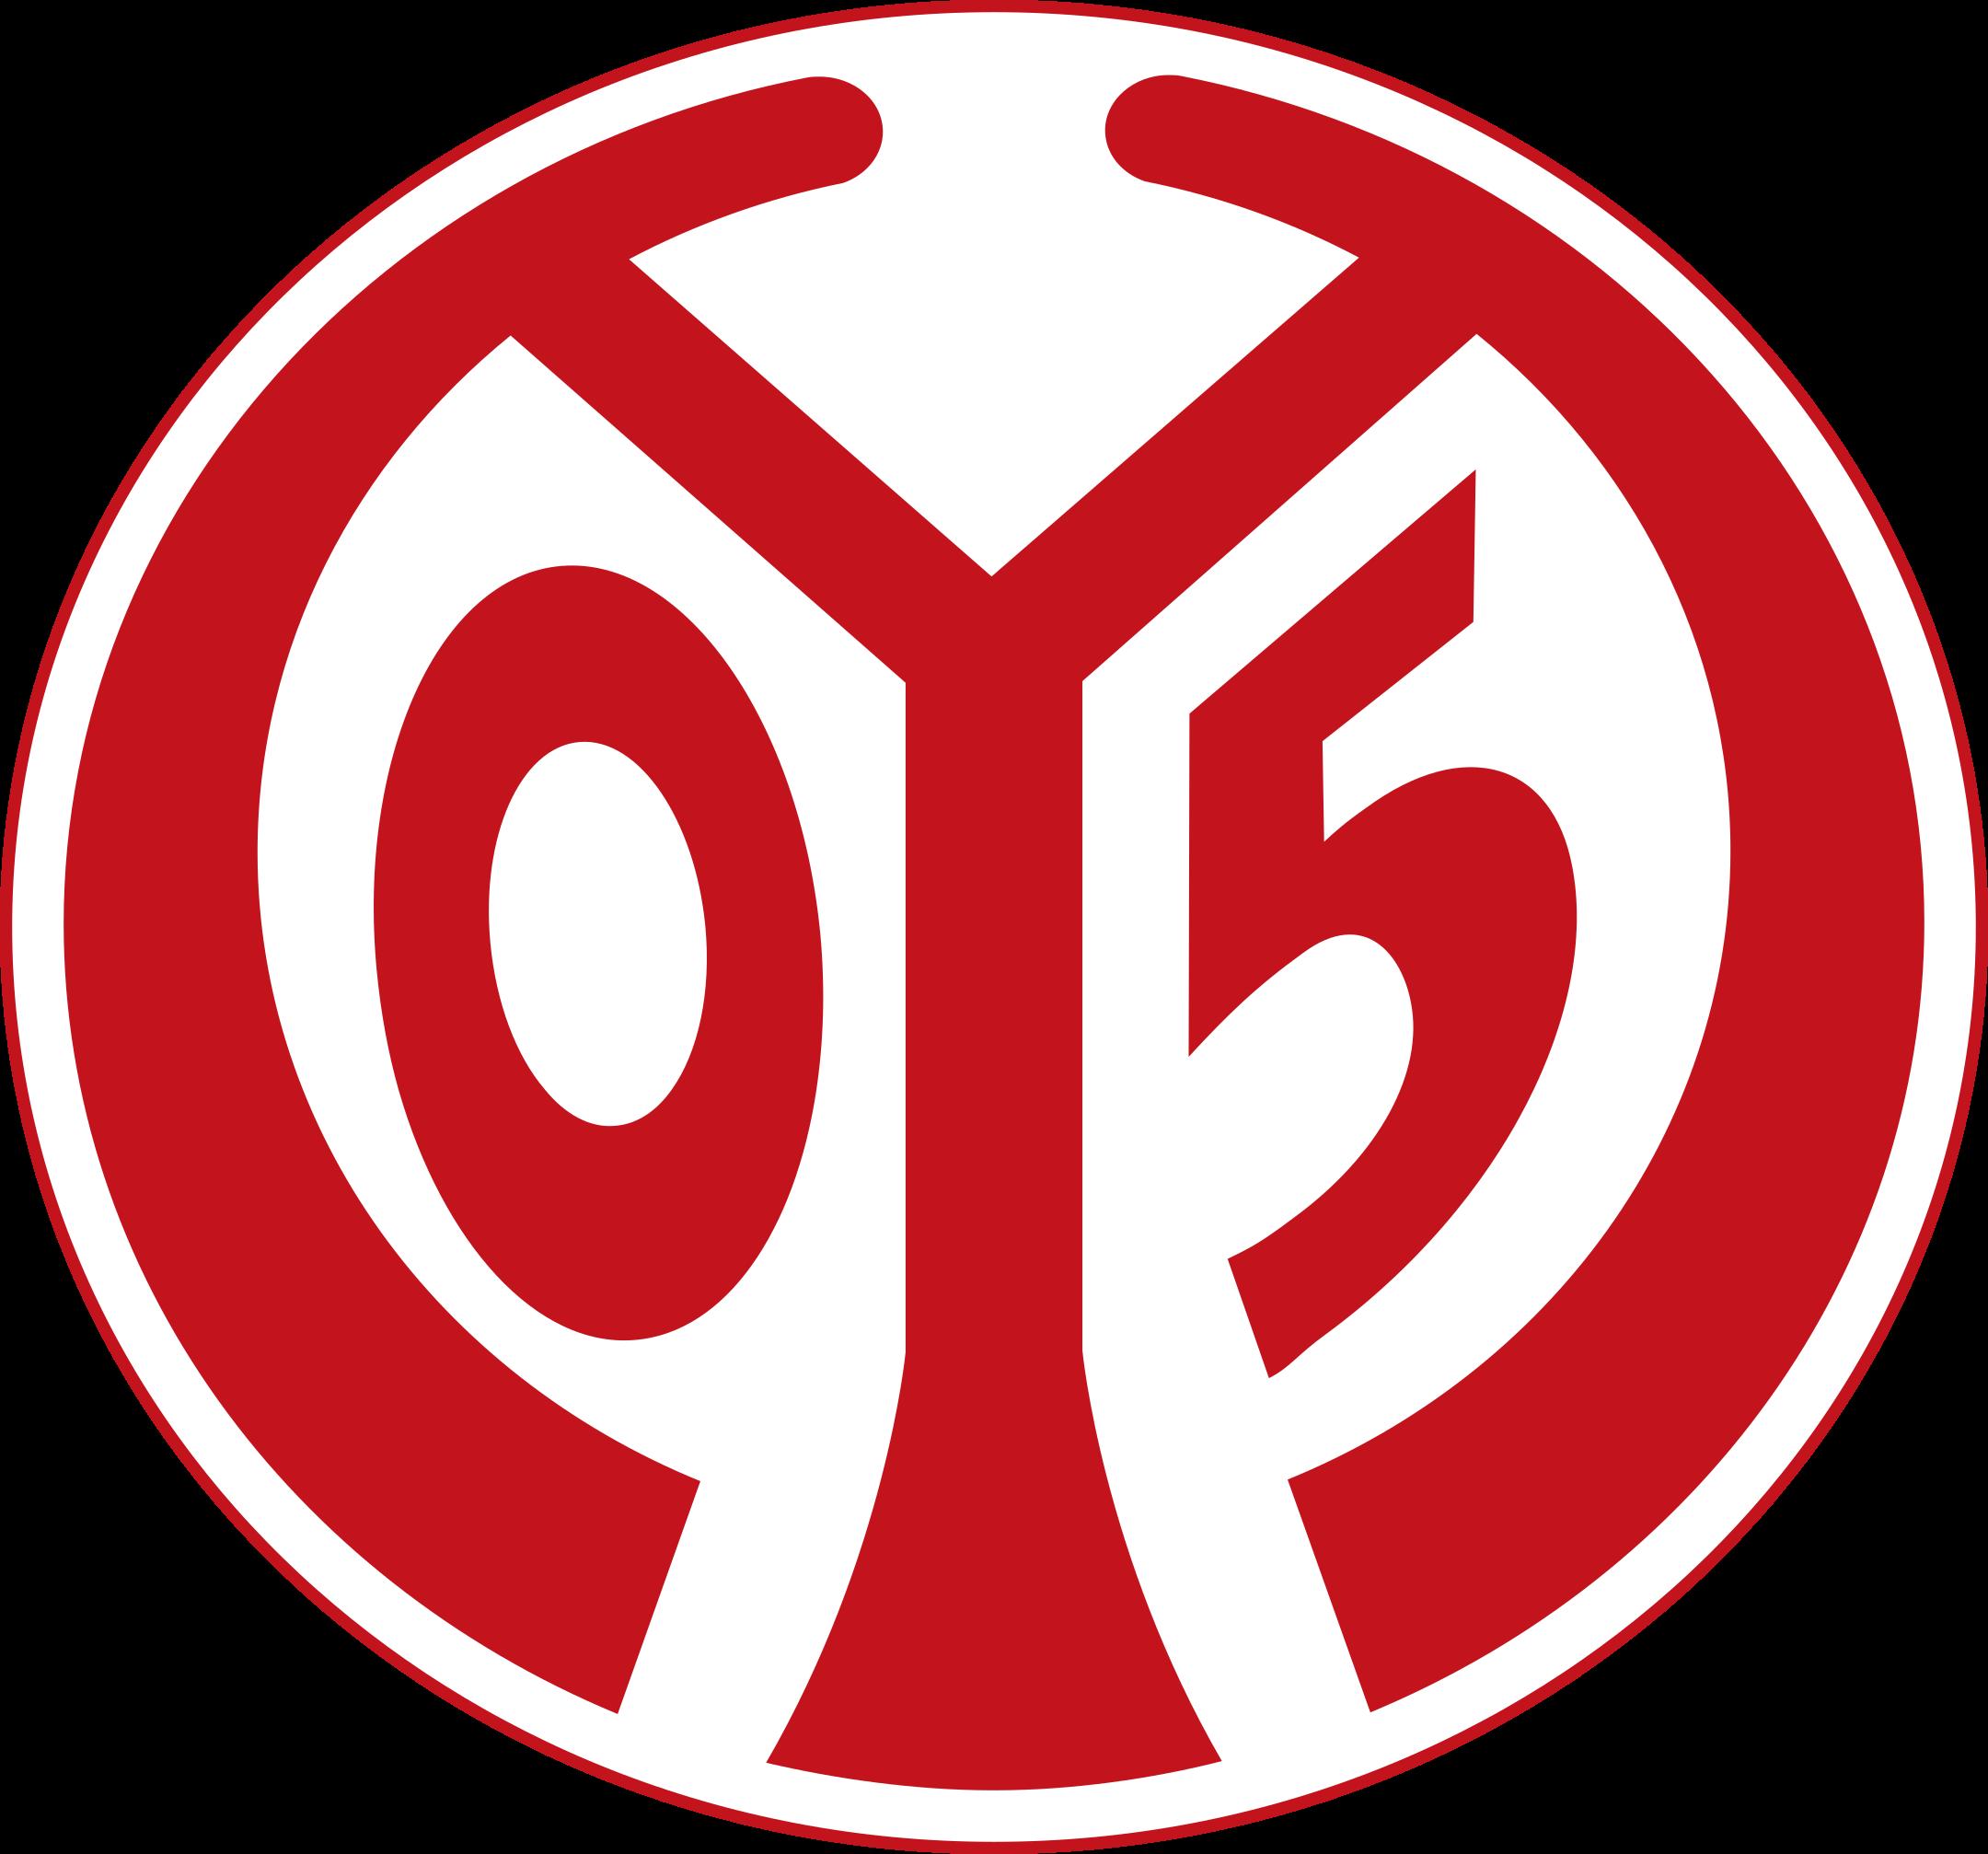 fsv mainz 05 logo 1 - FSV Mainz 05 Logo